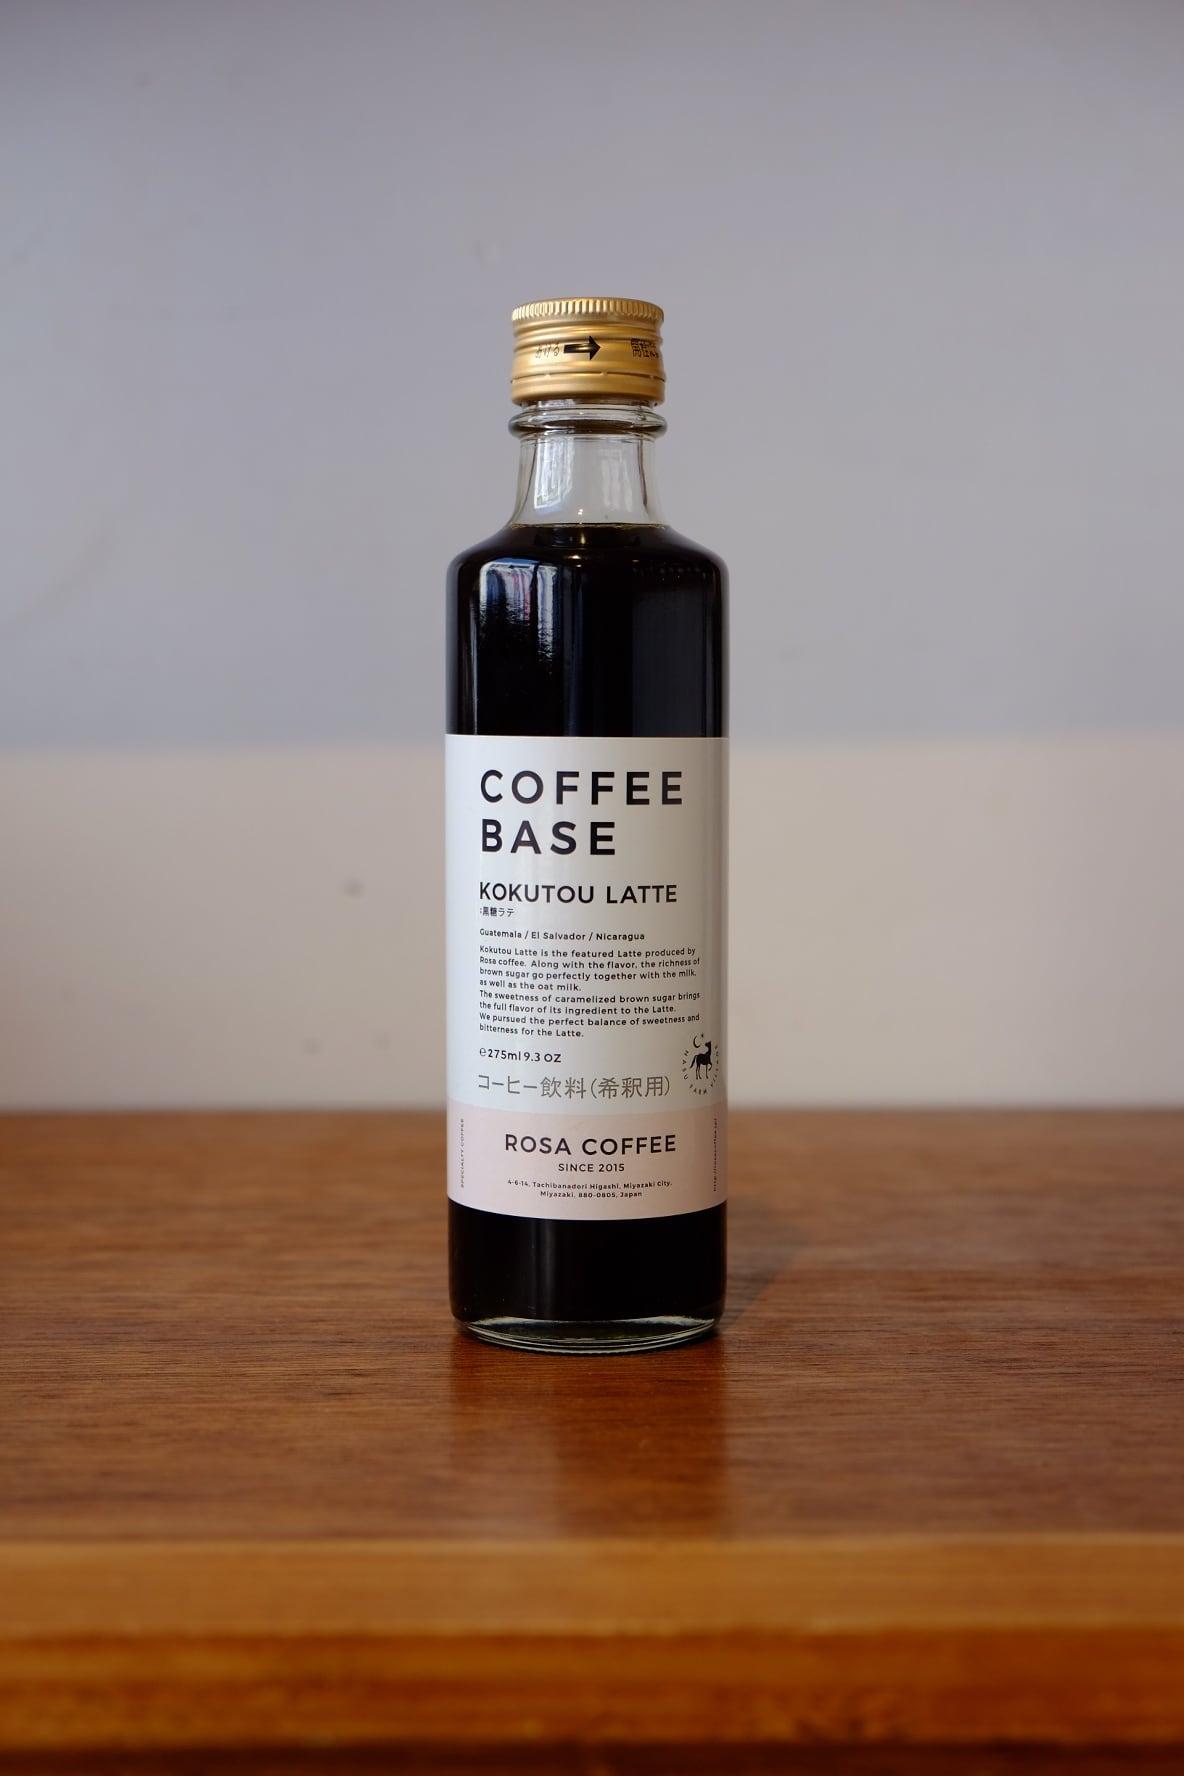 COFFEE BASE 黒糖ラテ ミニボトル